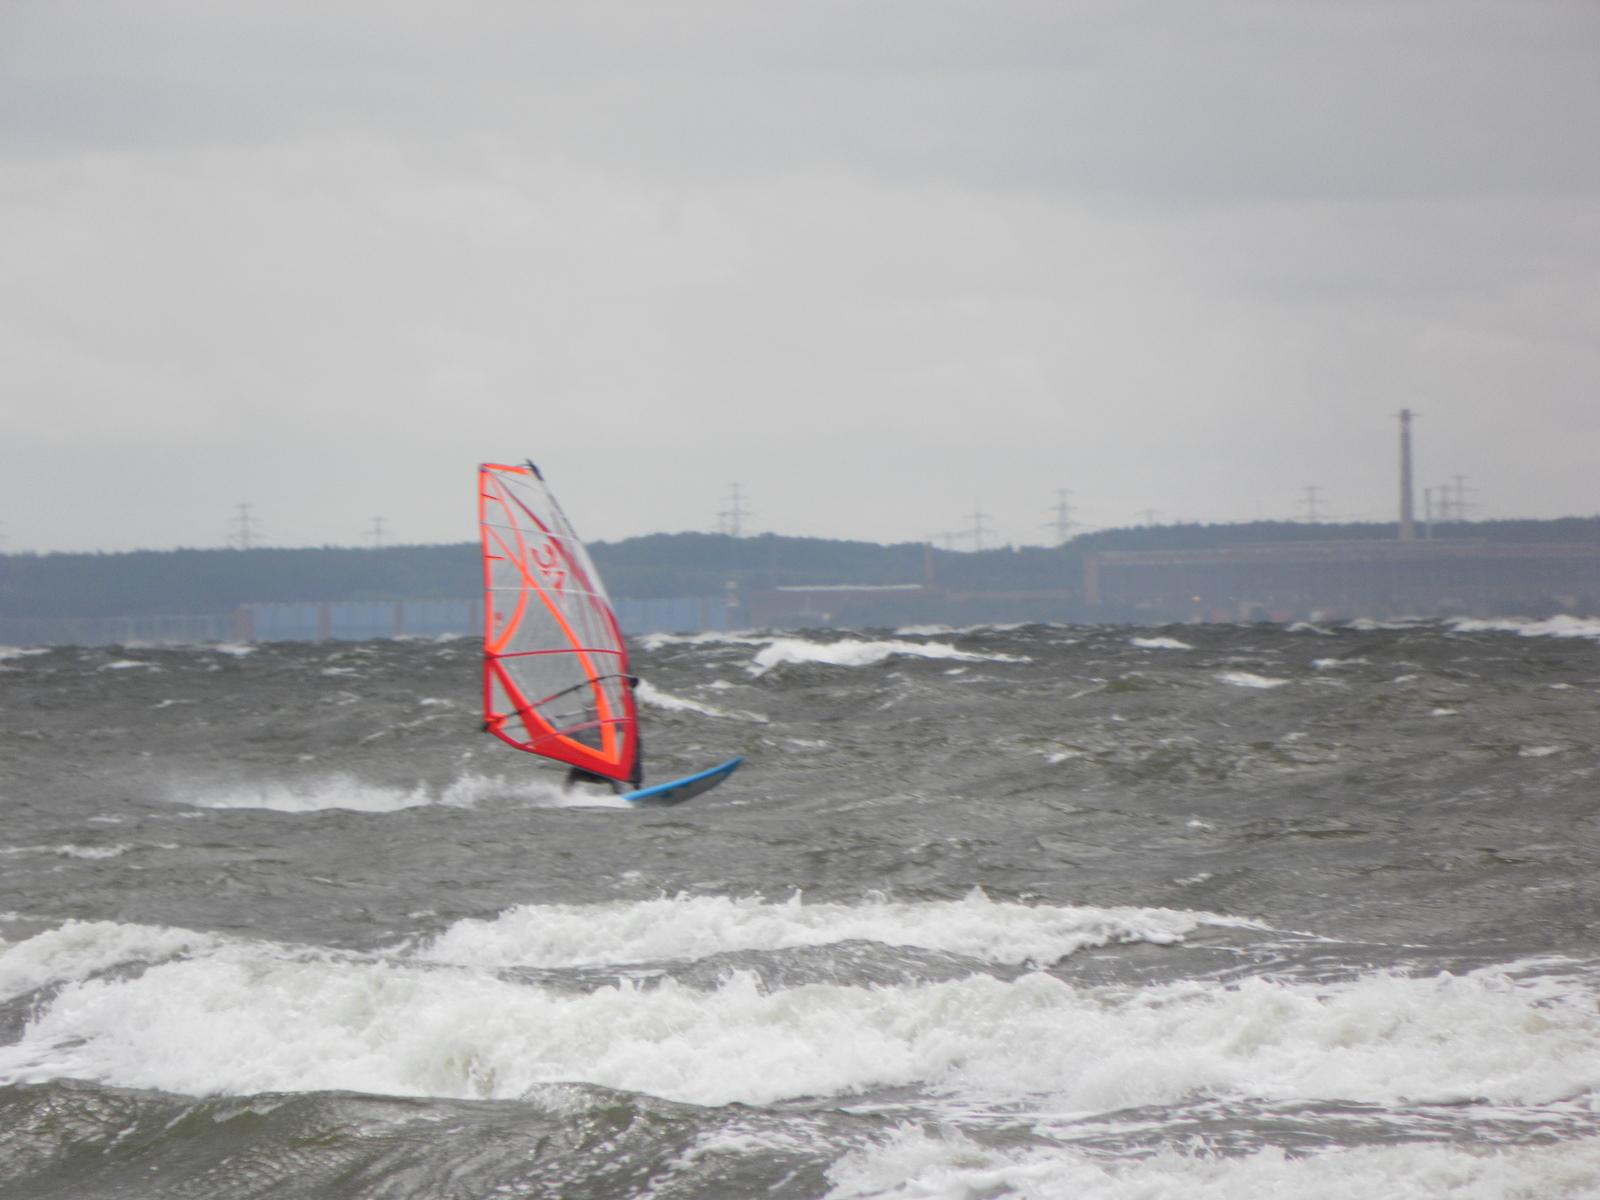 Windsurfen_Ruegen_-_Thiessow_SAM_0748.JPG